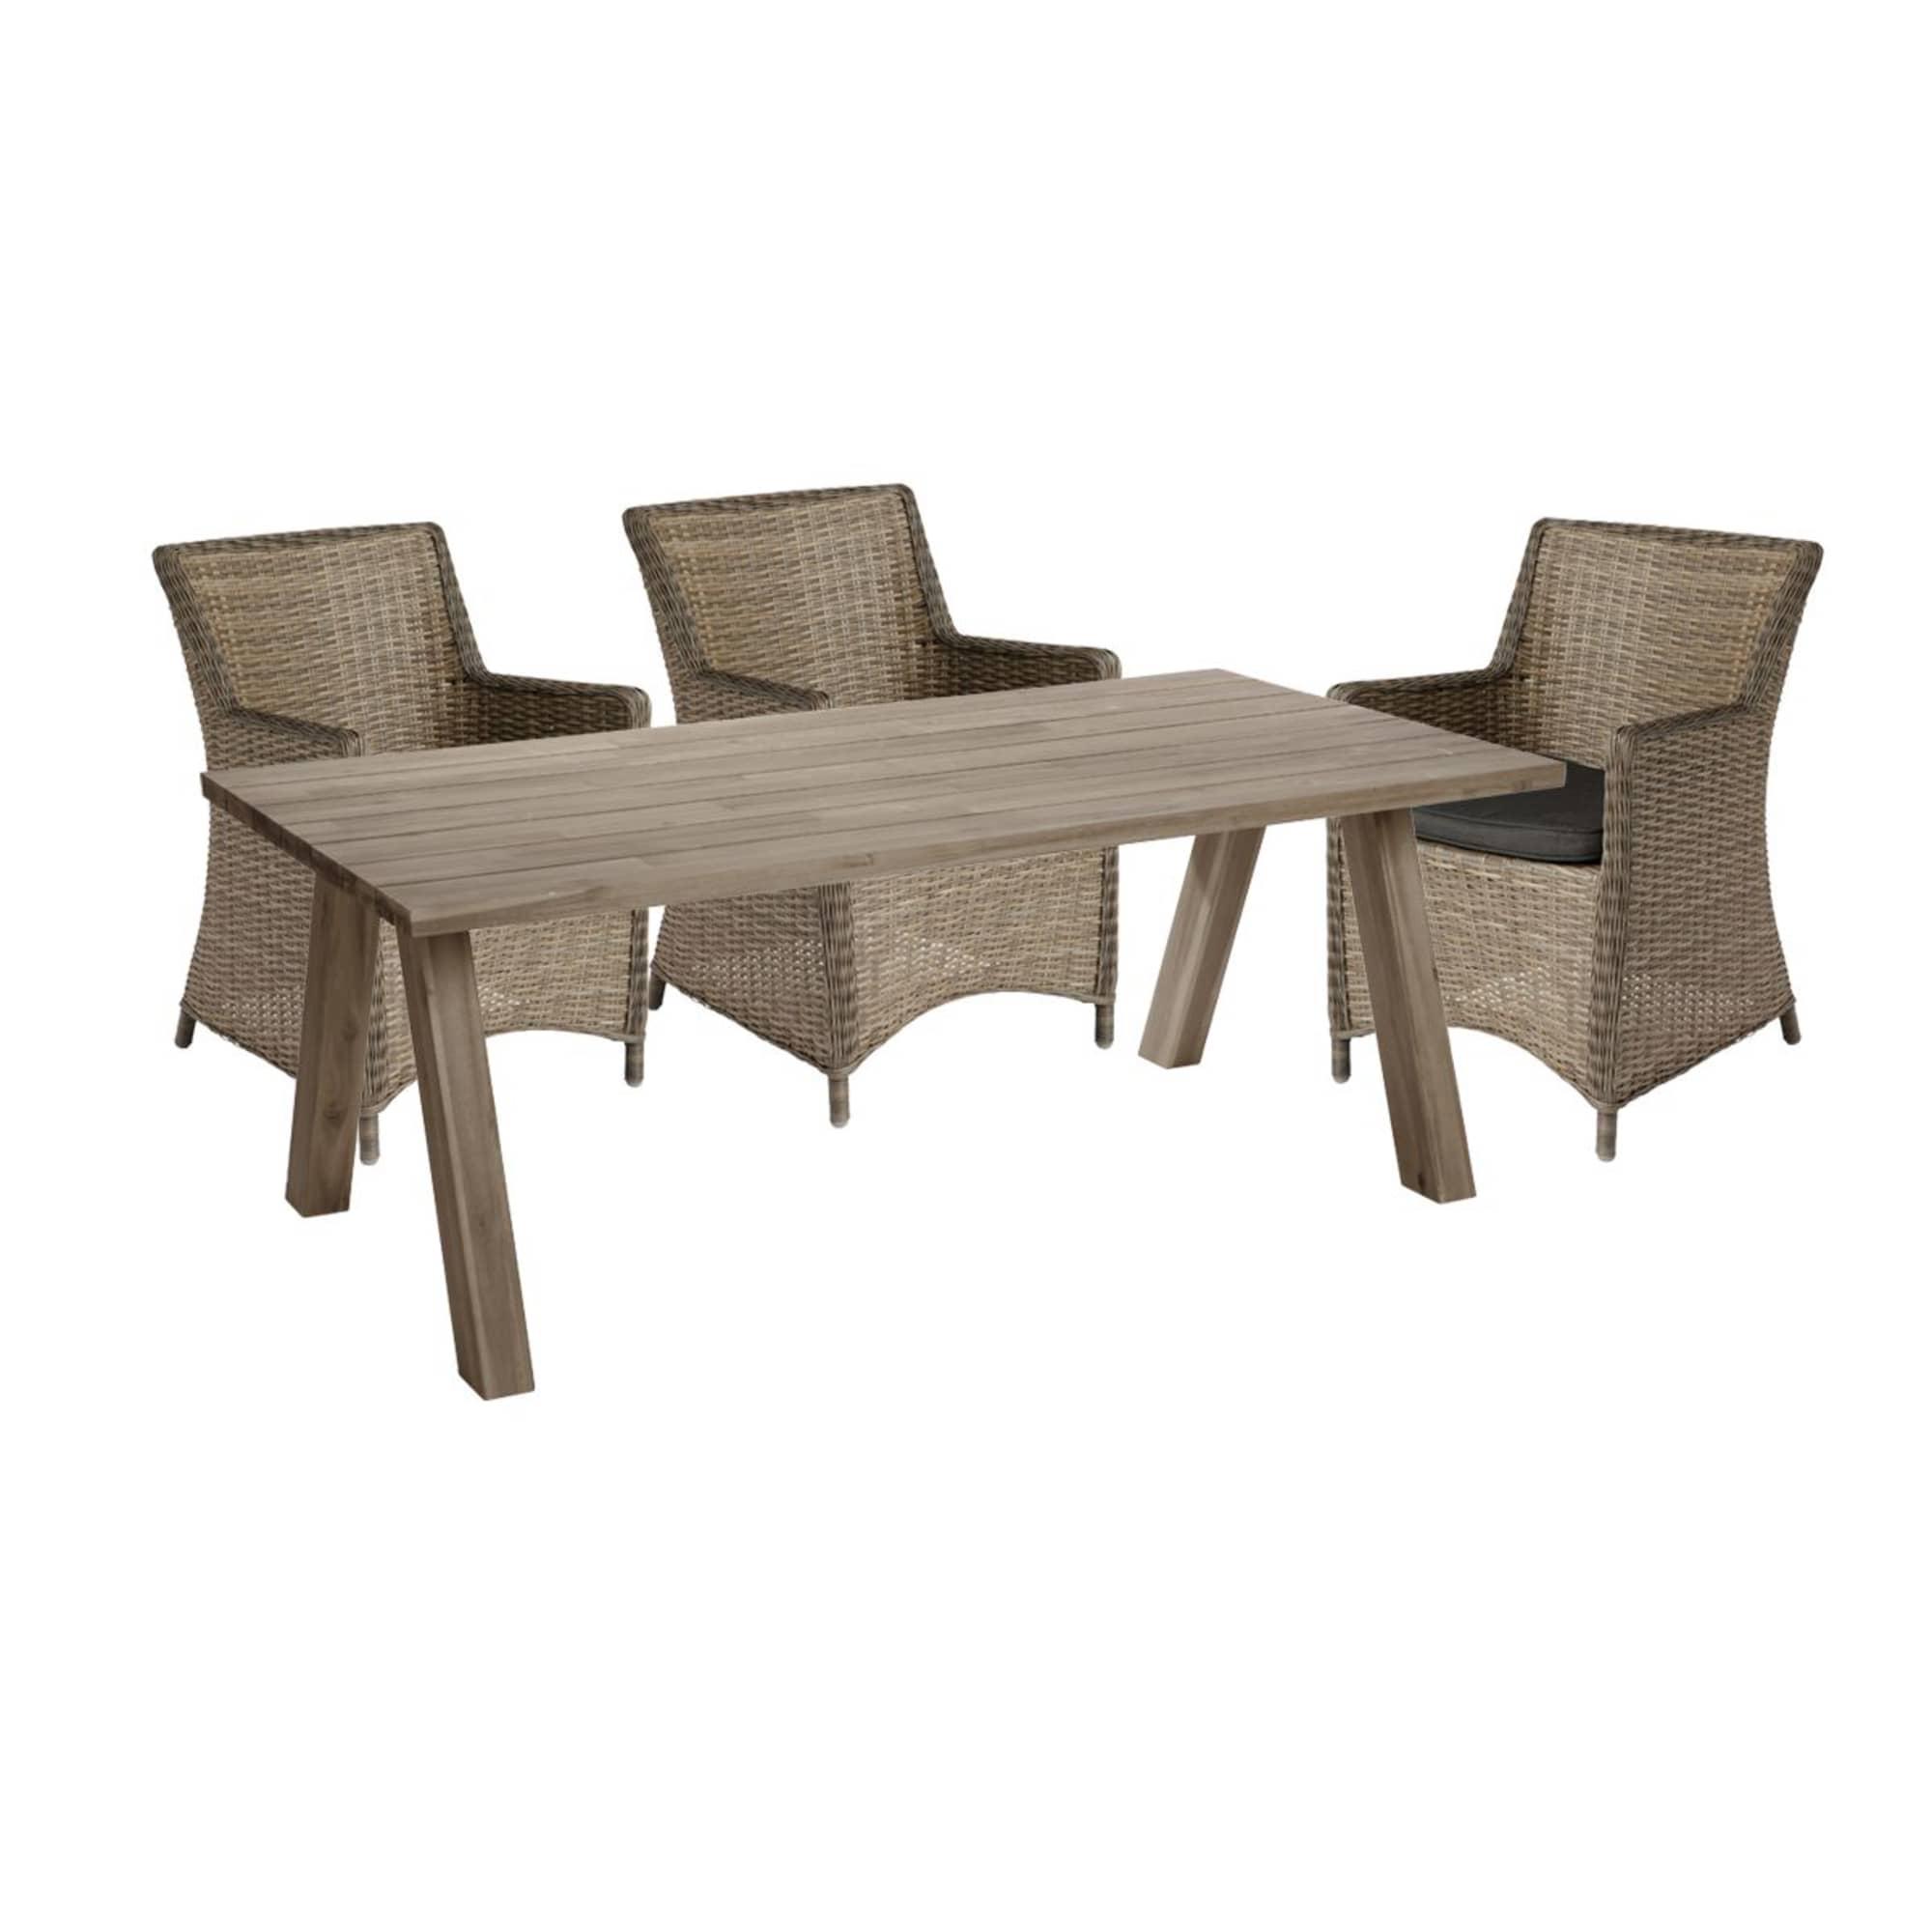 Gartenmöbel-Set, 5-tlg. Force, Rattan, Akazienholz